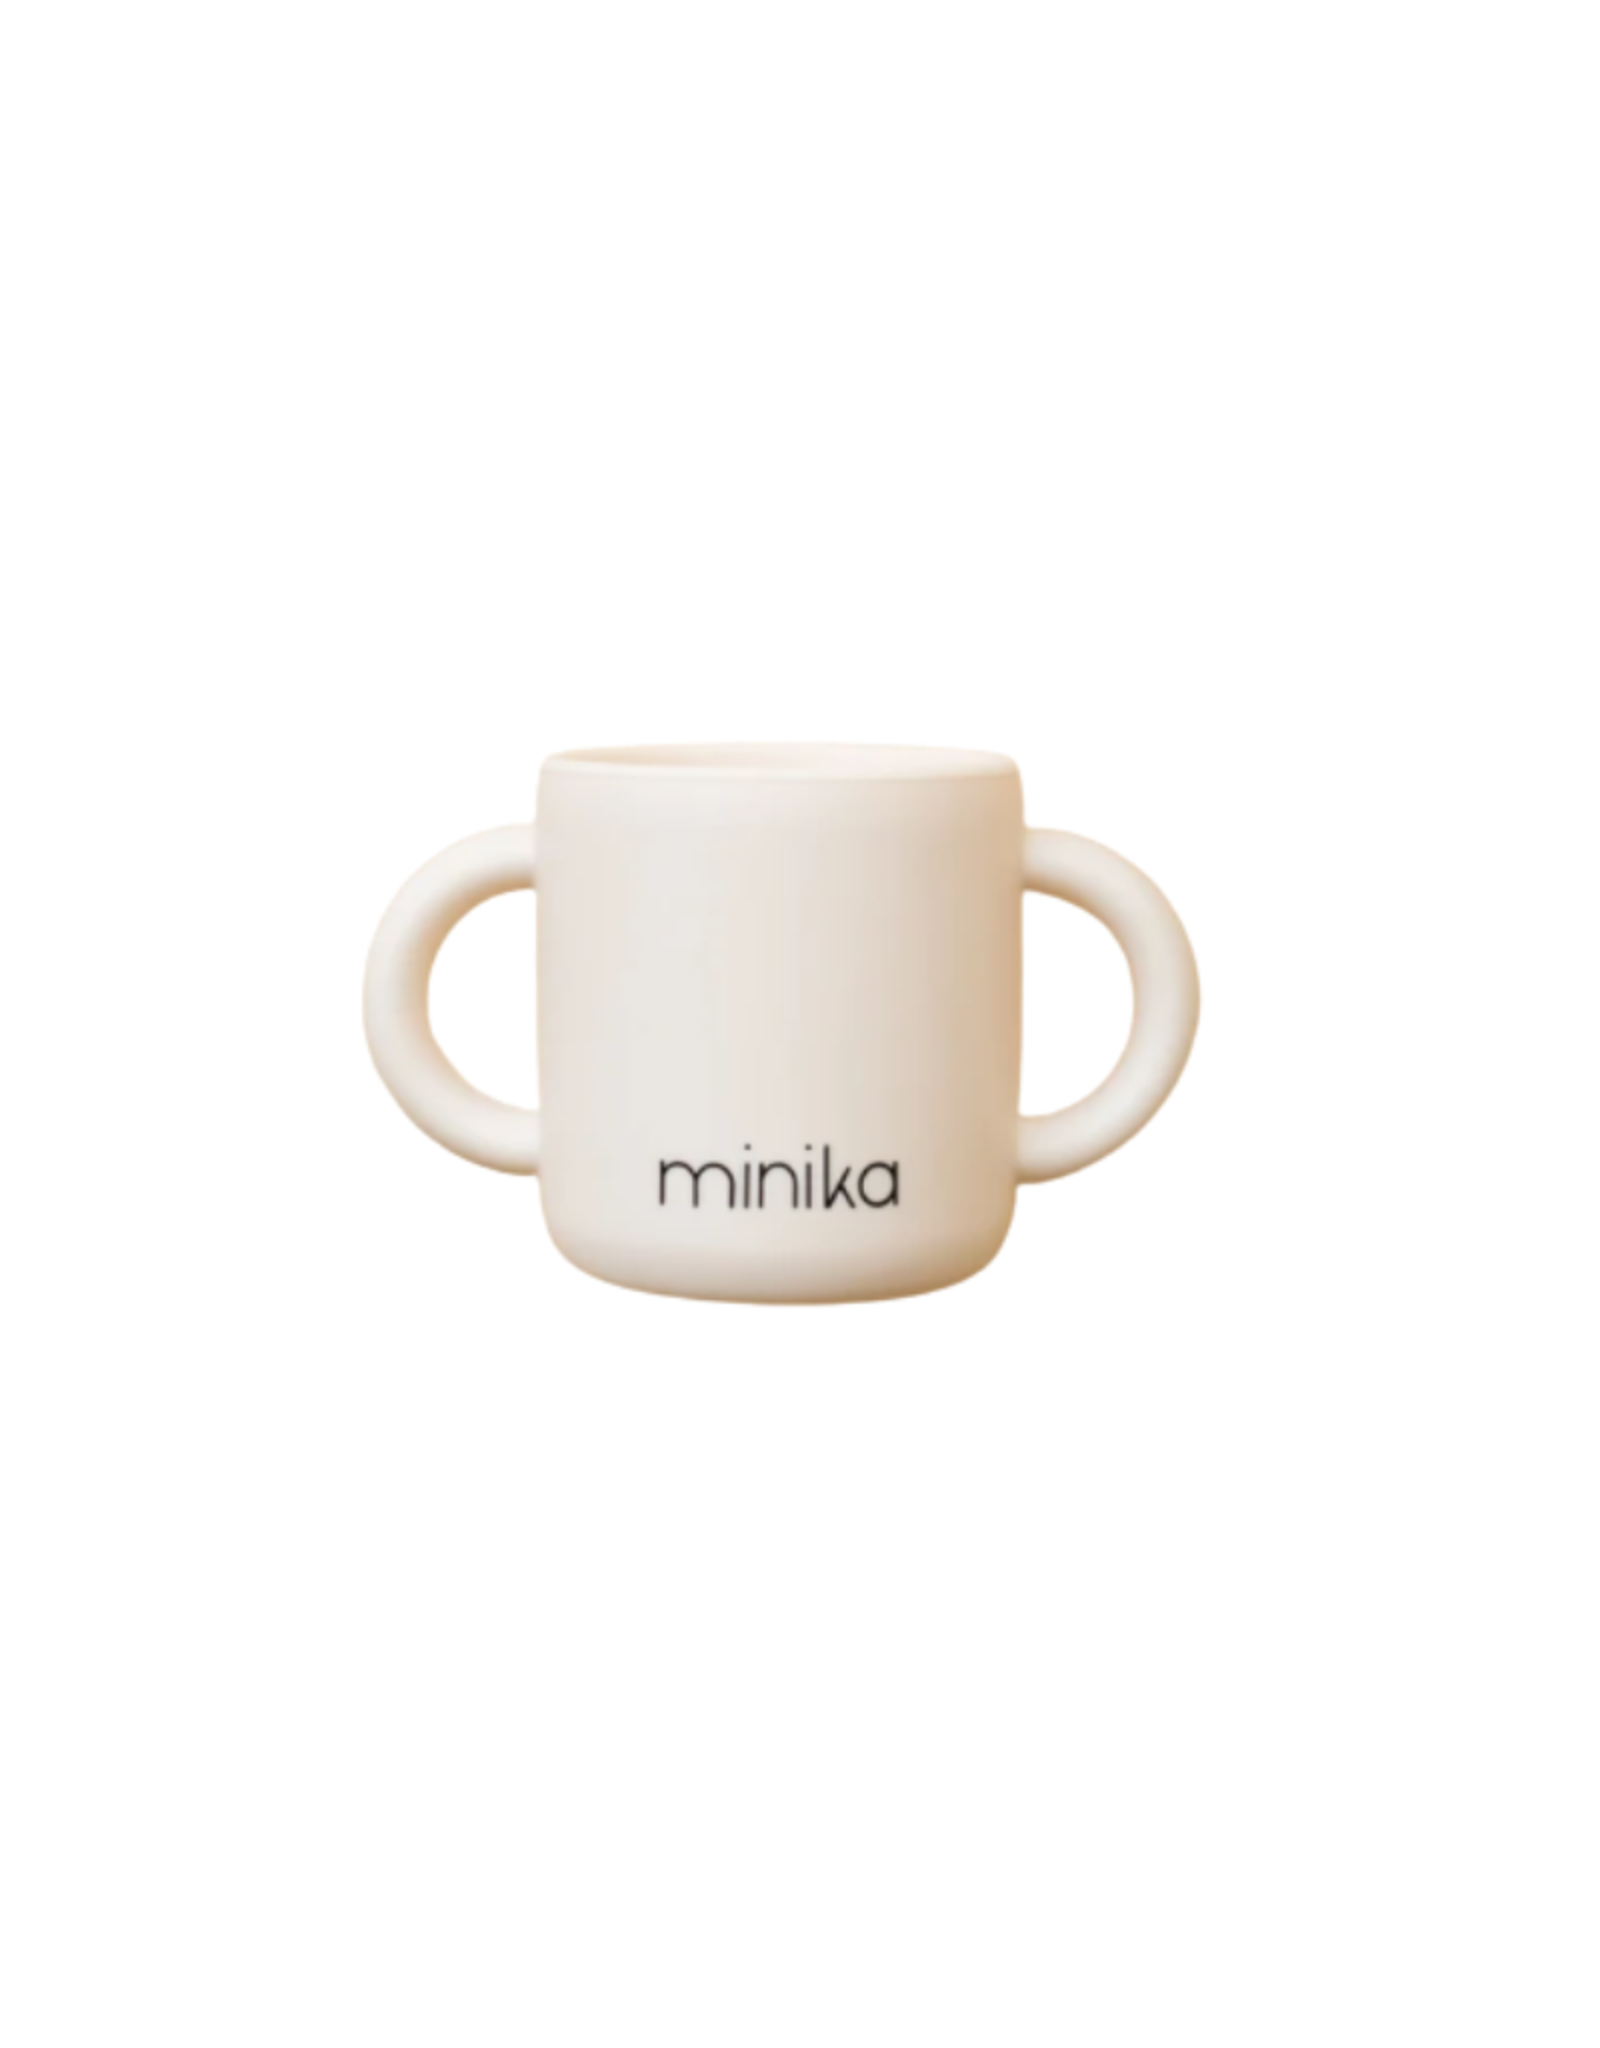 Minika Tasse d'apprentissage avec 2 poignées en silicone-coquillage